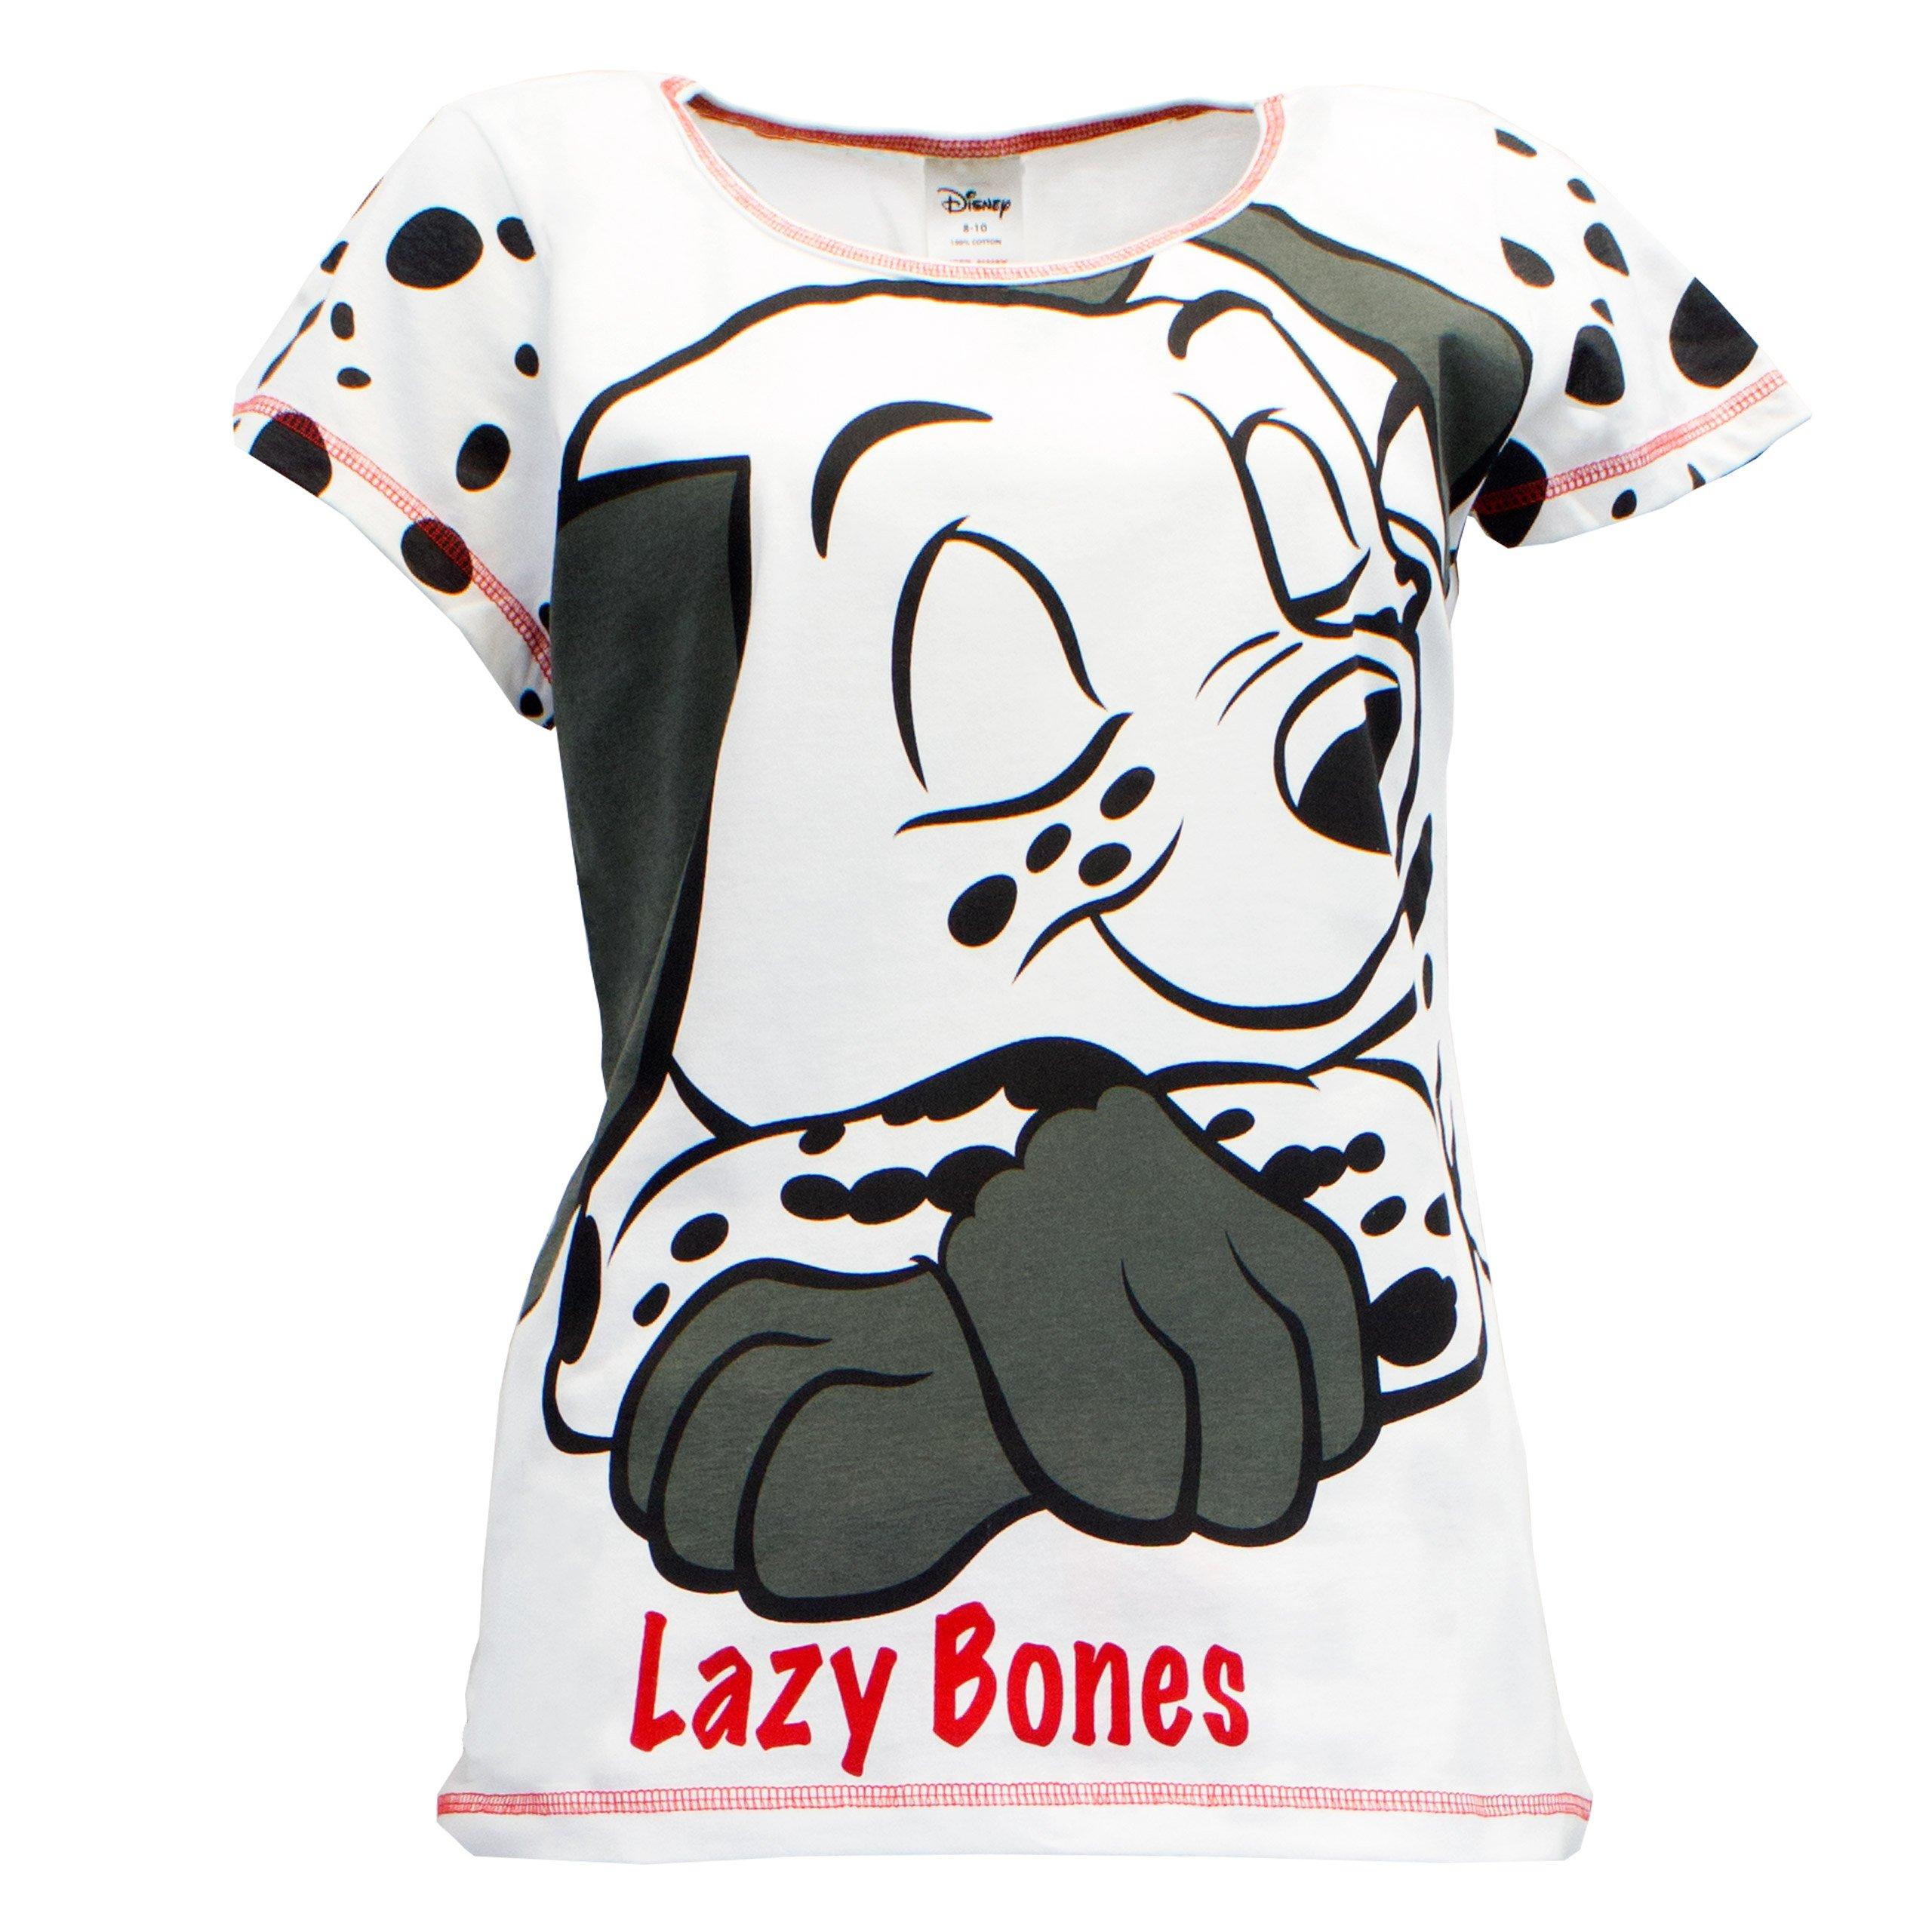 101 Dalmatians Womens' Disney 101 Dalmatians Pajamas White Size Small by Disney (Image #2)